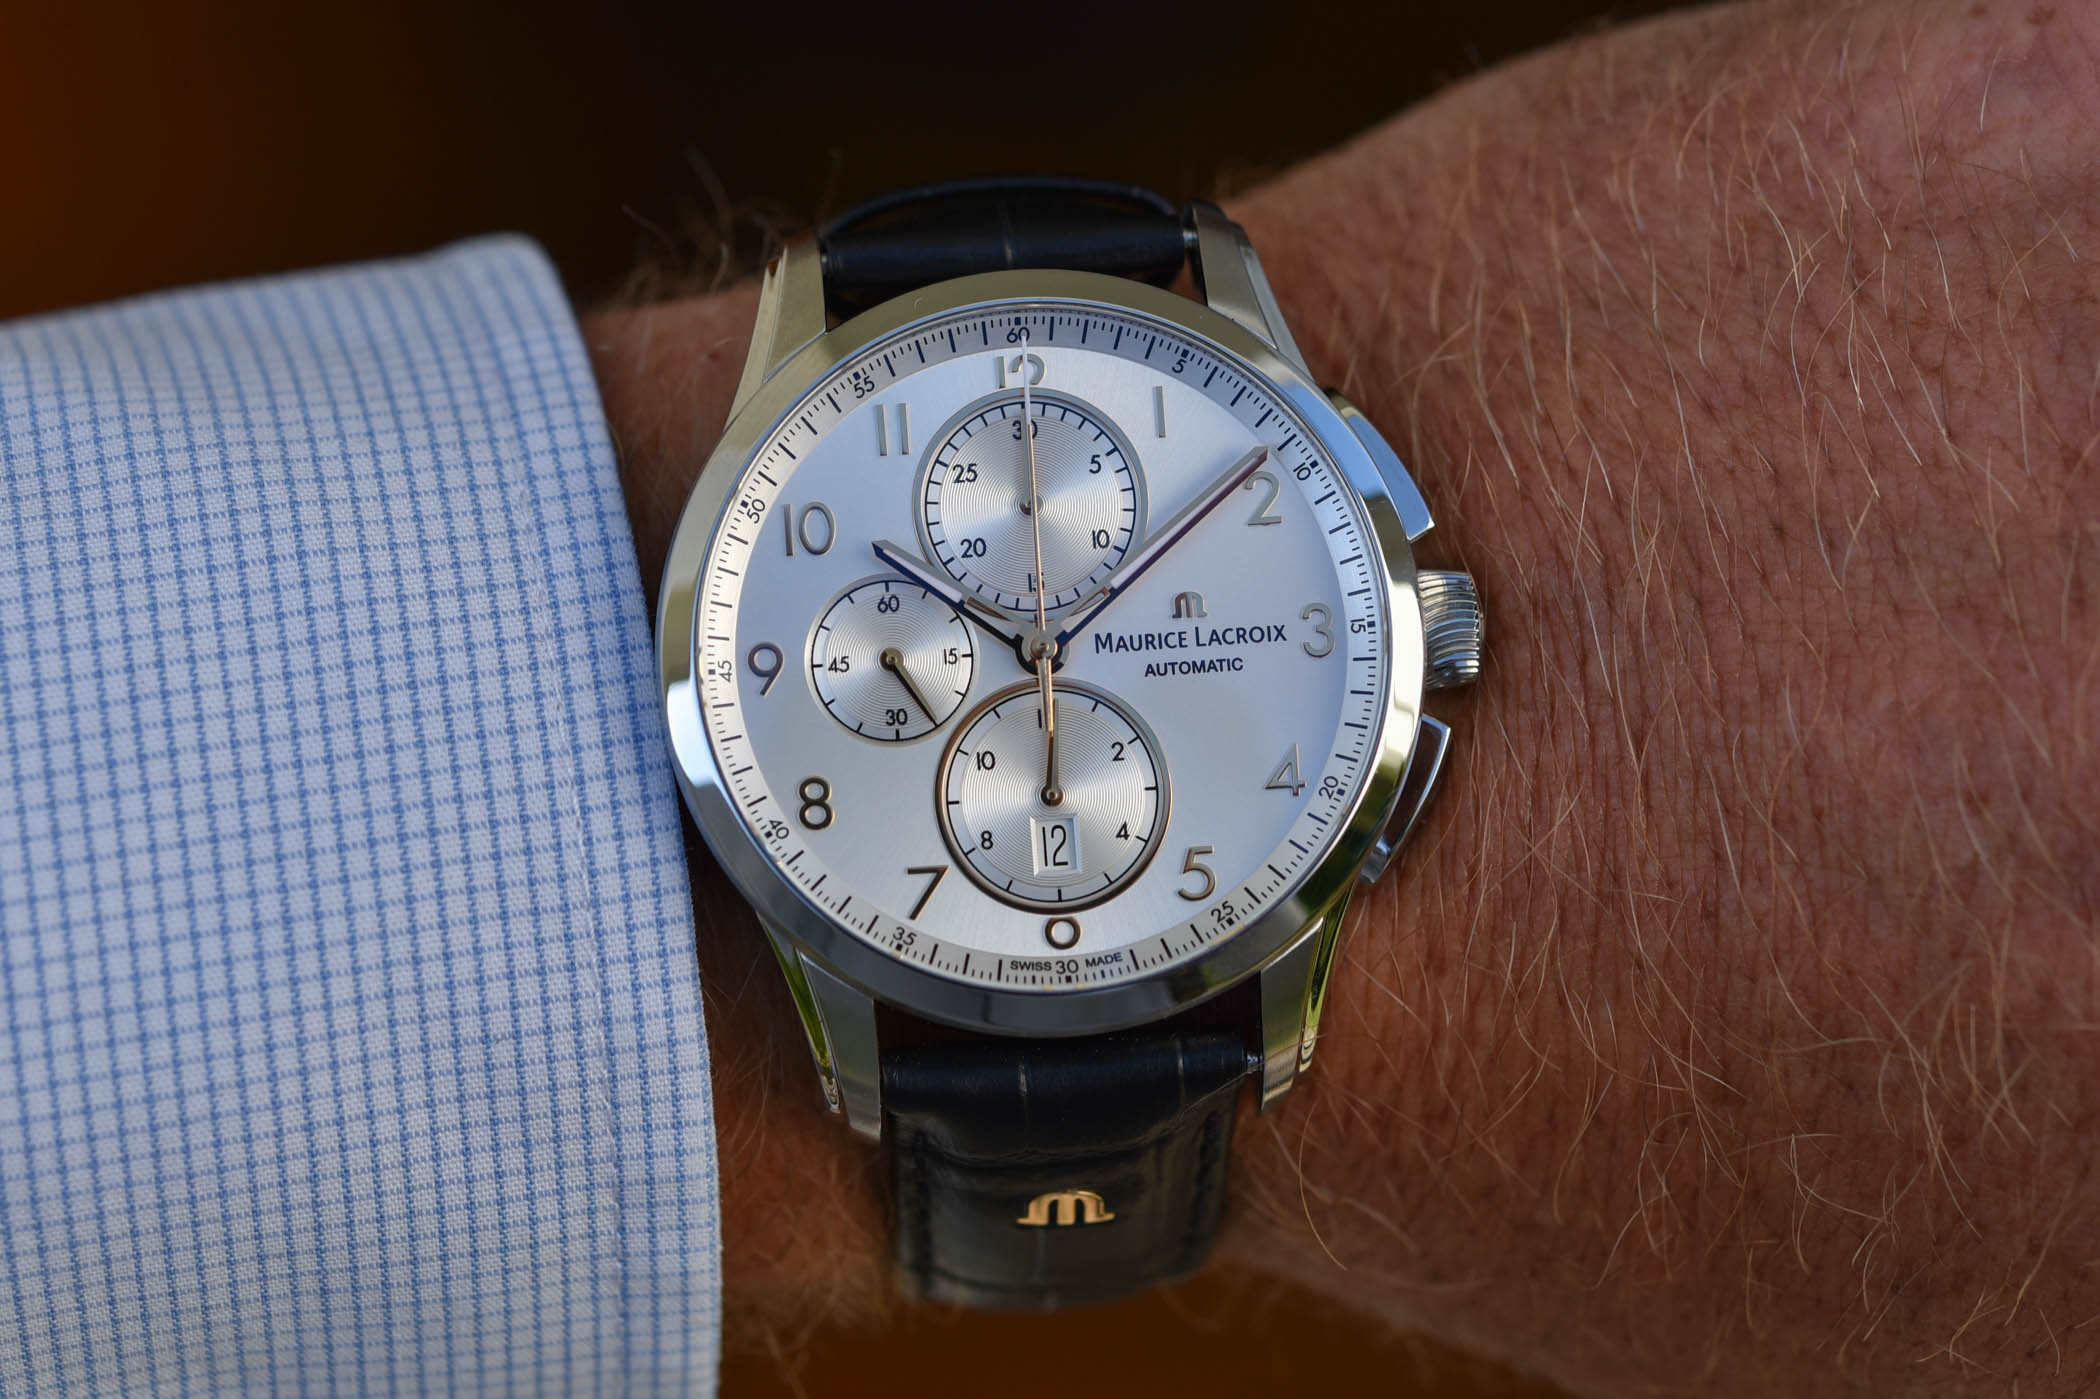 Maurice Lacroix Pontos Chronograph Automatic 2020 - 4